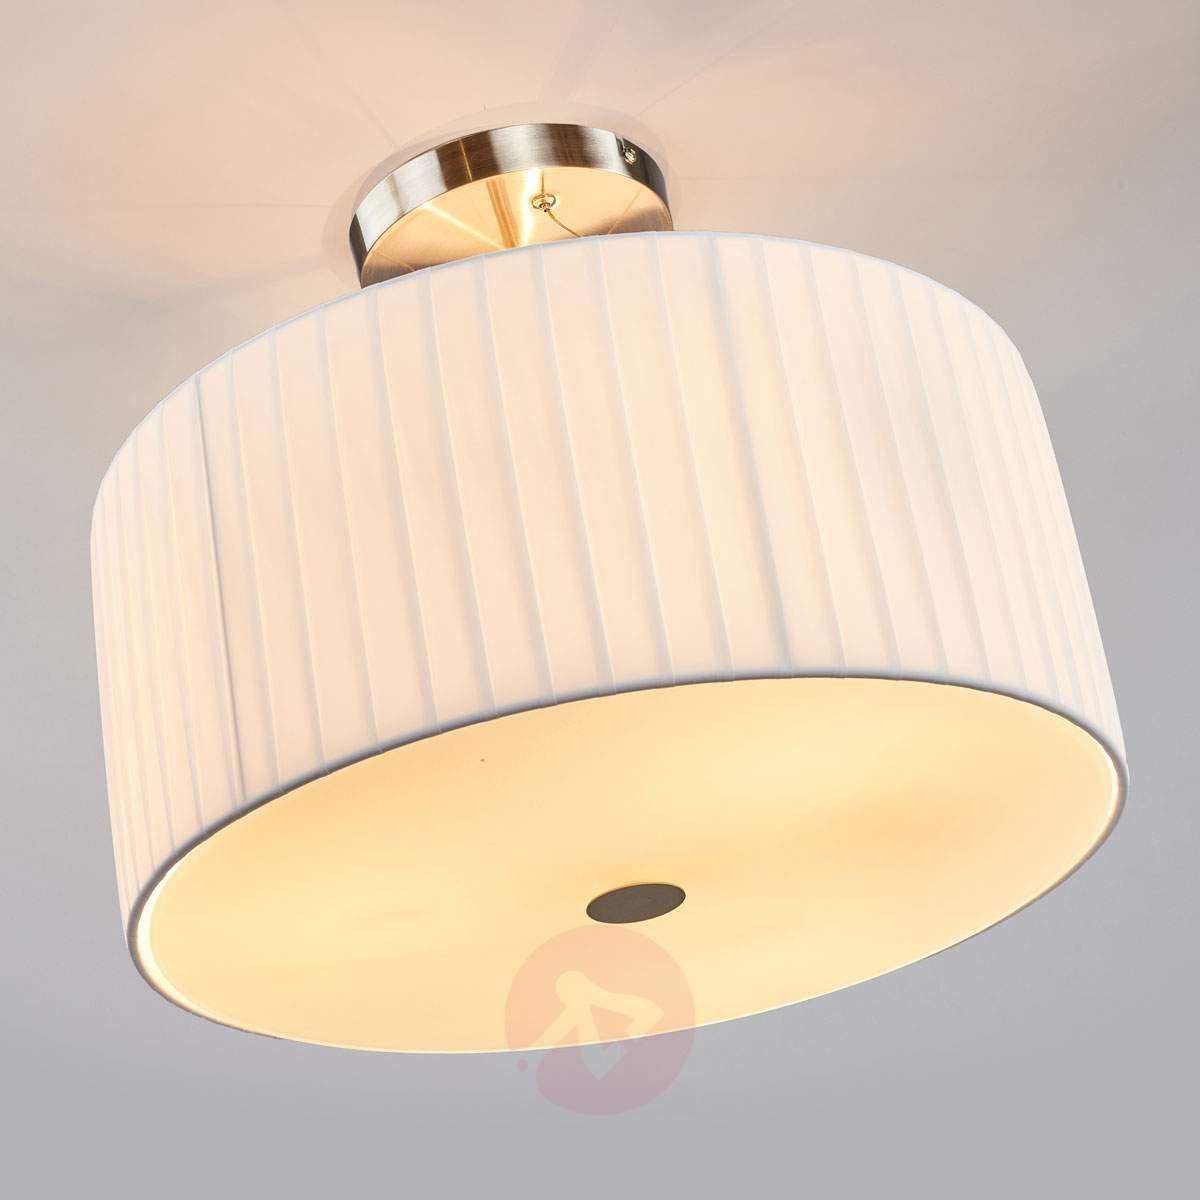 Subtelna Lampa Sufitowa La Nube Lampy Sufitowe Ceiling Lights